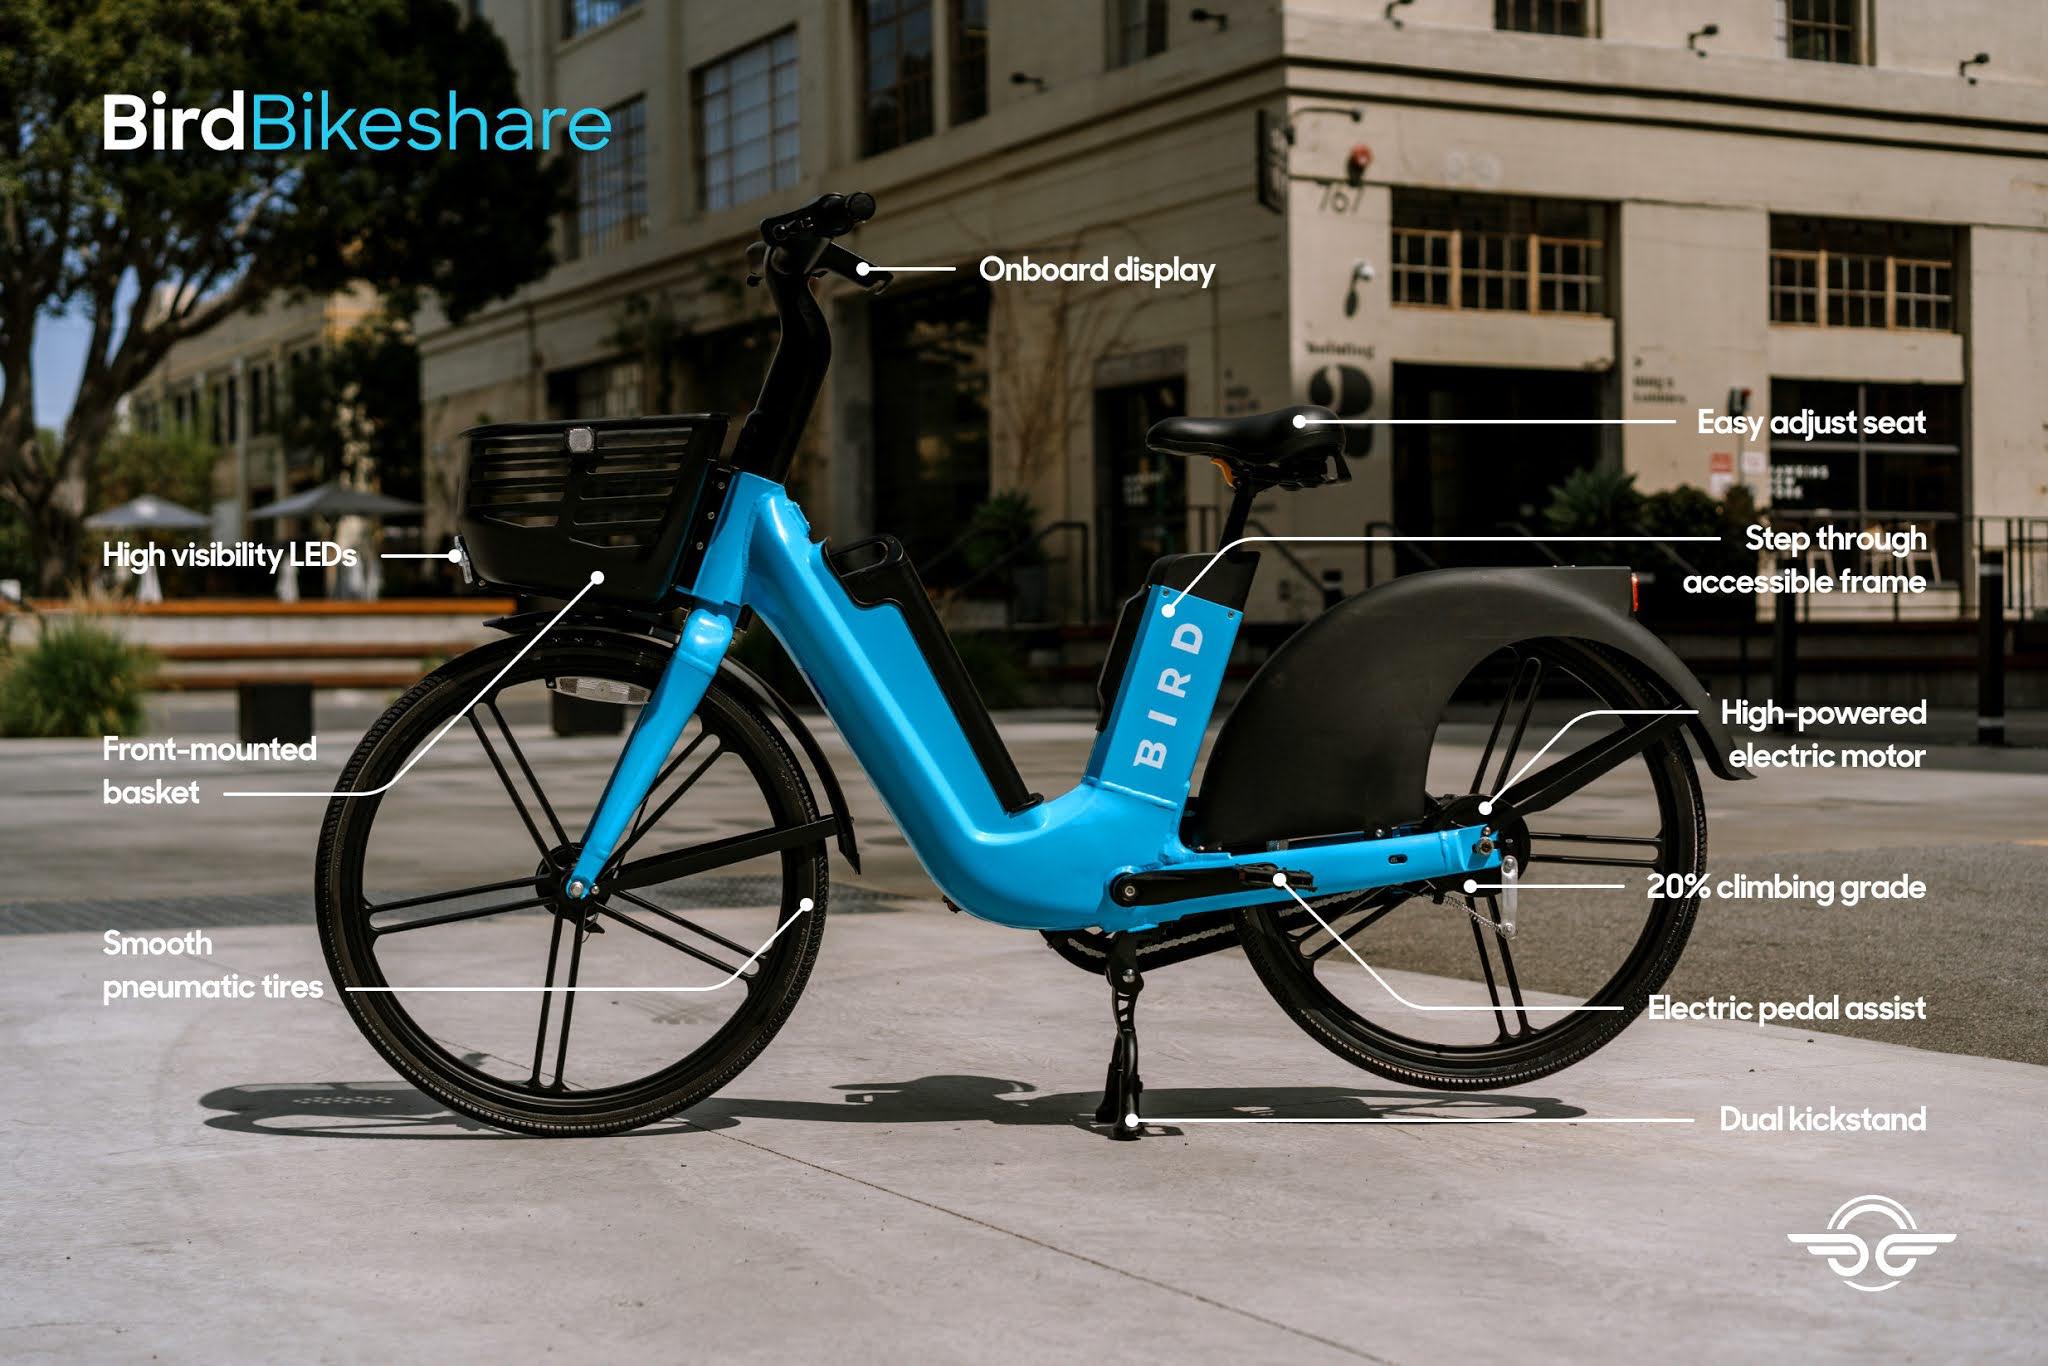 Bird Launches Shared E-Bike And Smart Bikeshare Platform To Meet Demand For Eco-Friendly Transportation